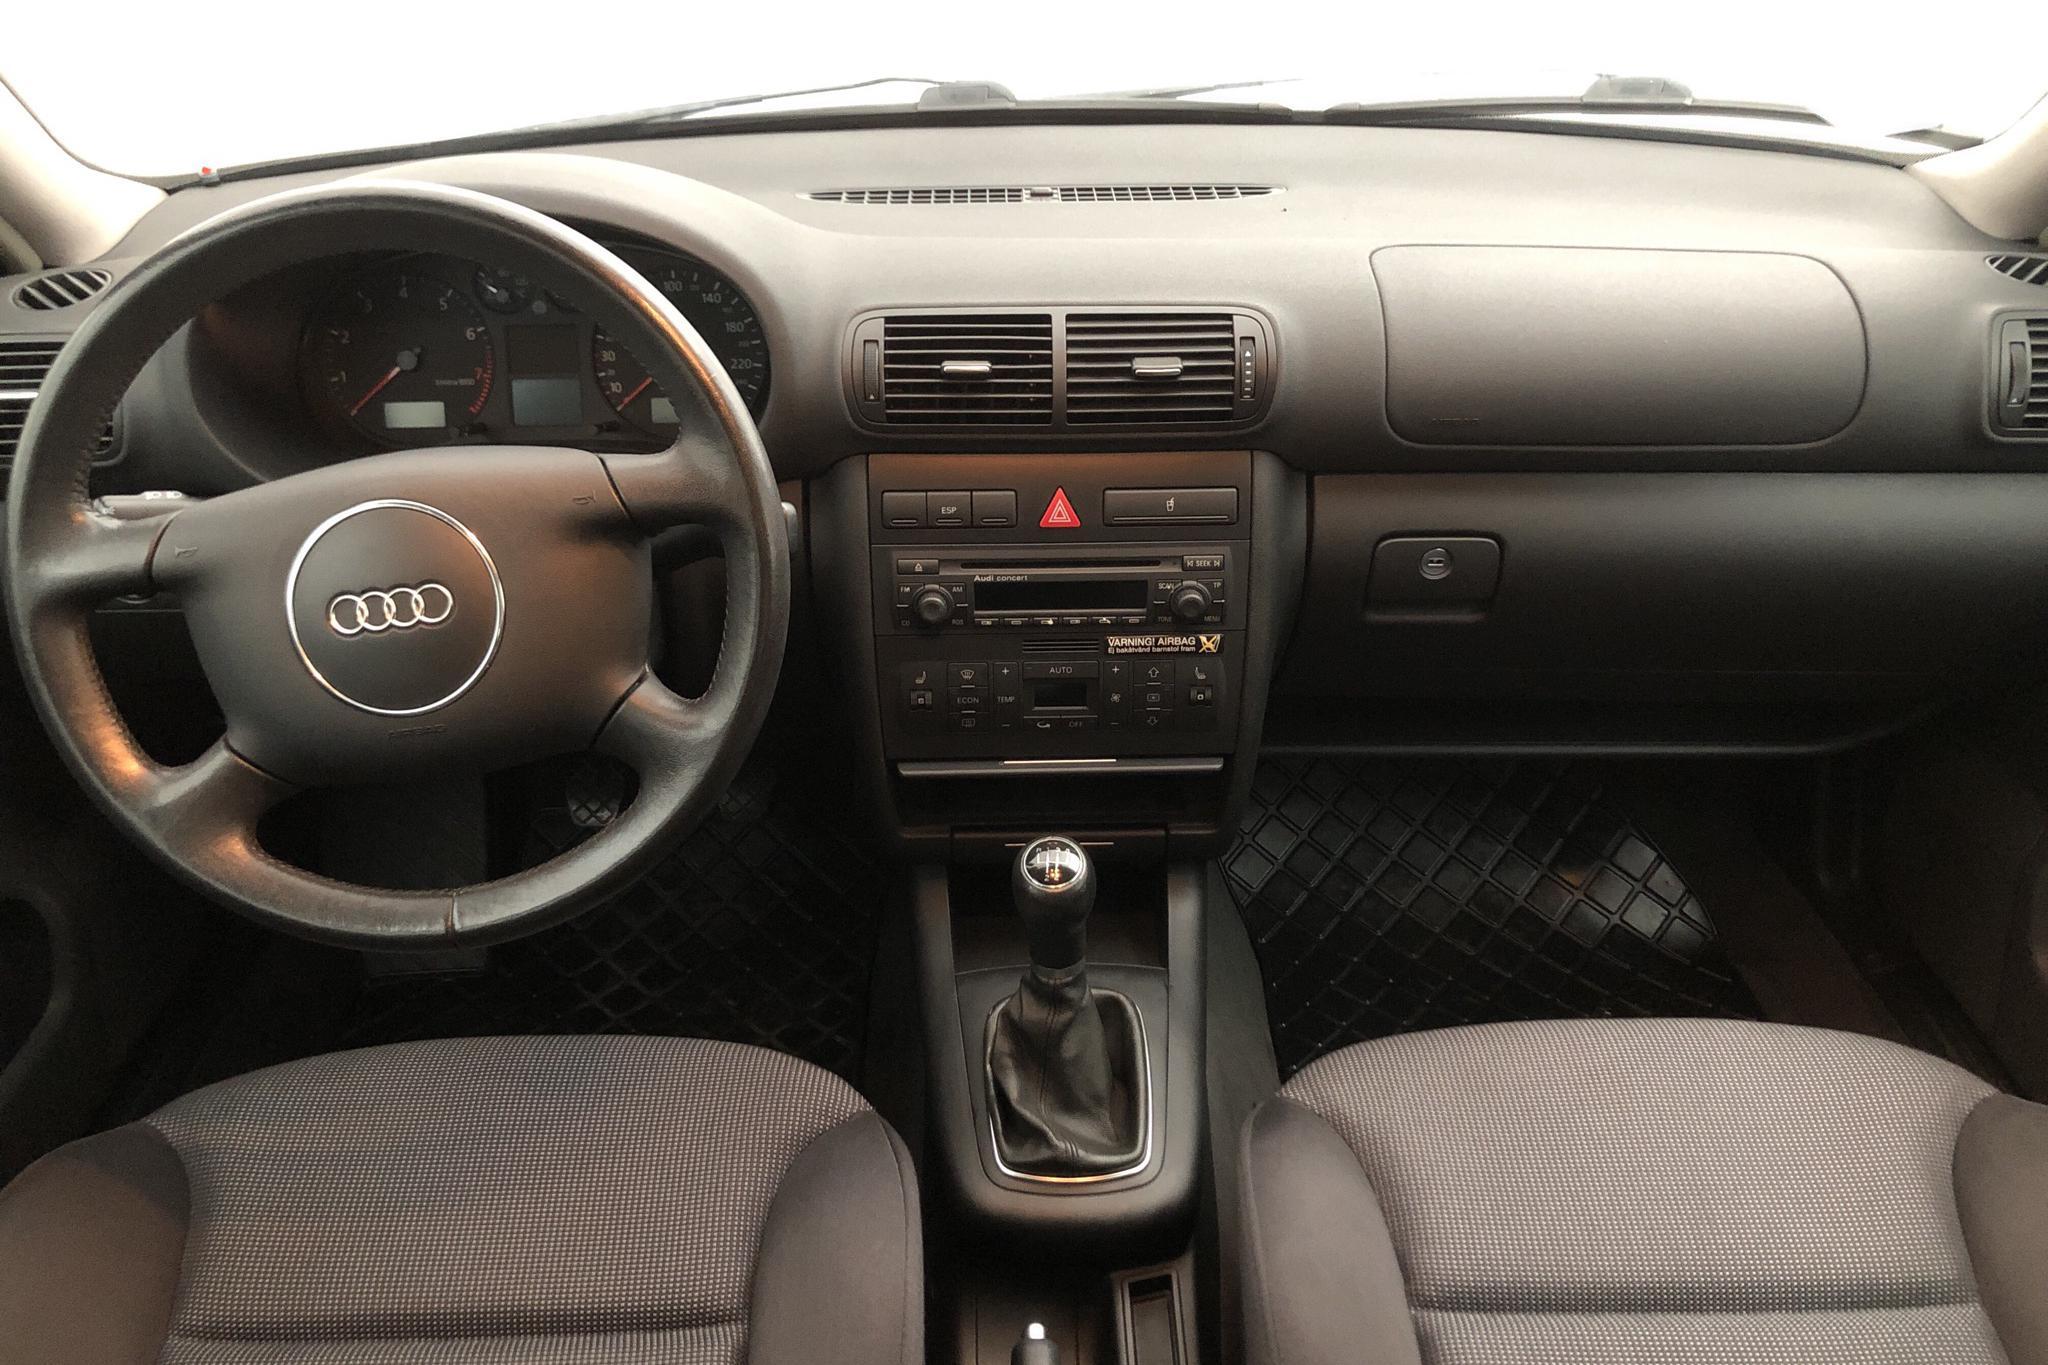 Audi A3 1.6 5dr (100hk) - 11 364 mil - Manuell - silver - 2003